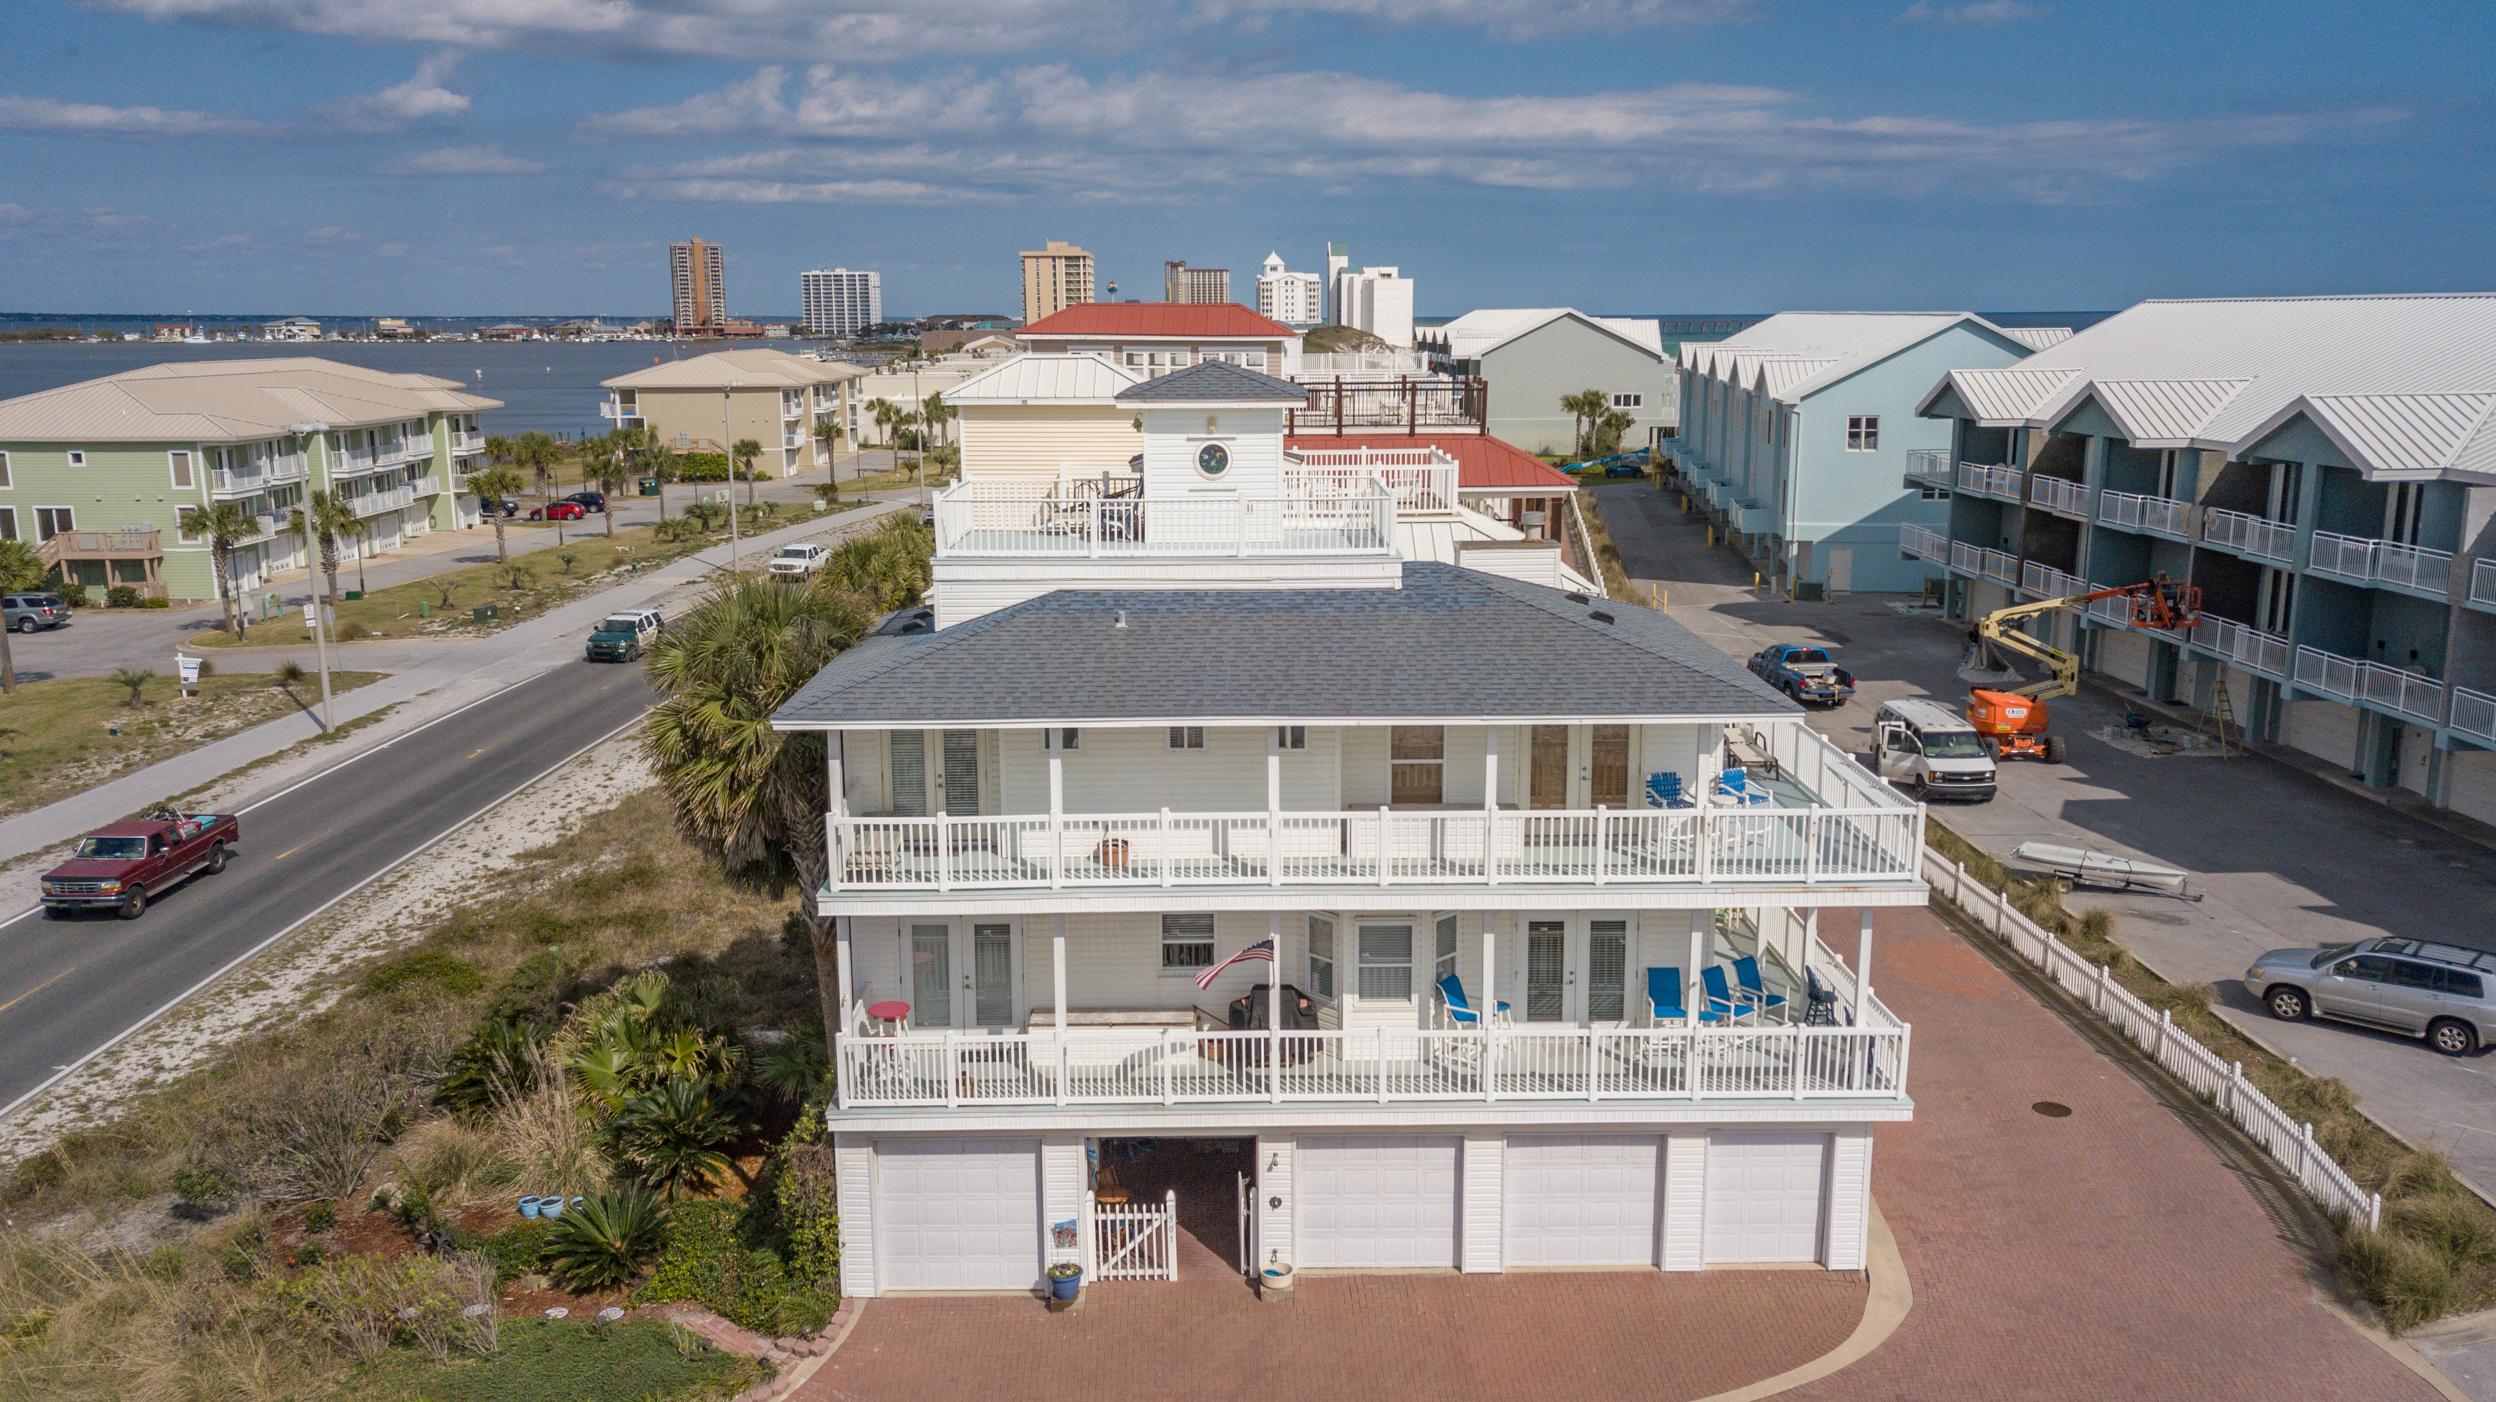 White Sands Cottage 501 Life's a Beach House Townhouse rental in White Sands Pensacola Beach in Pensacola Beach Florida - #50